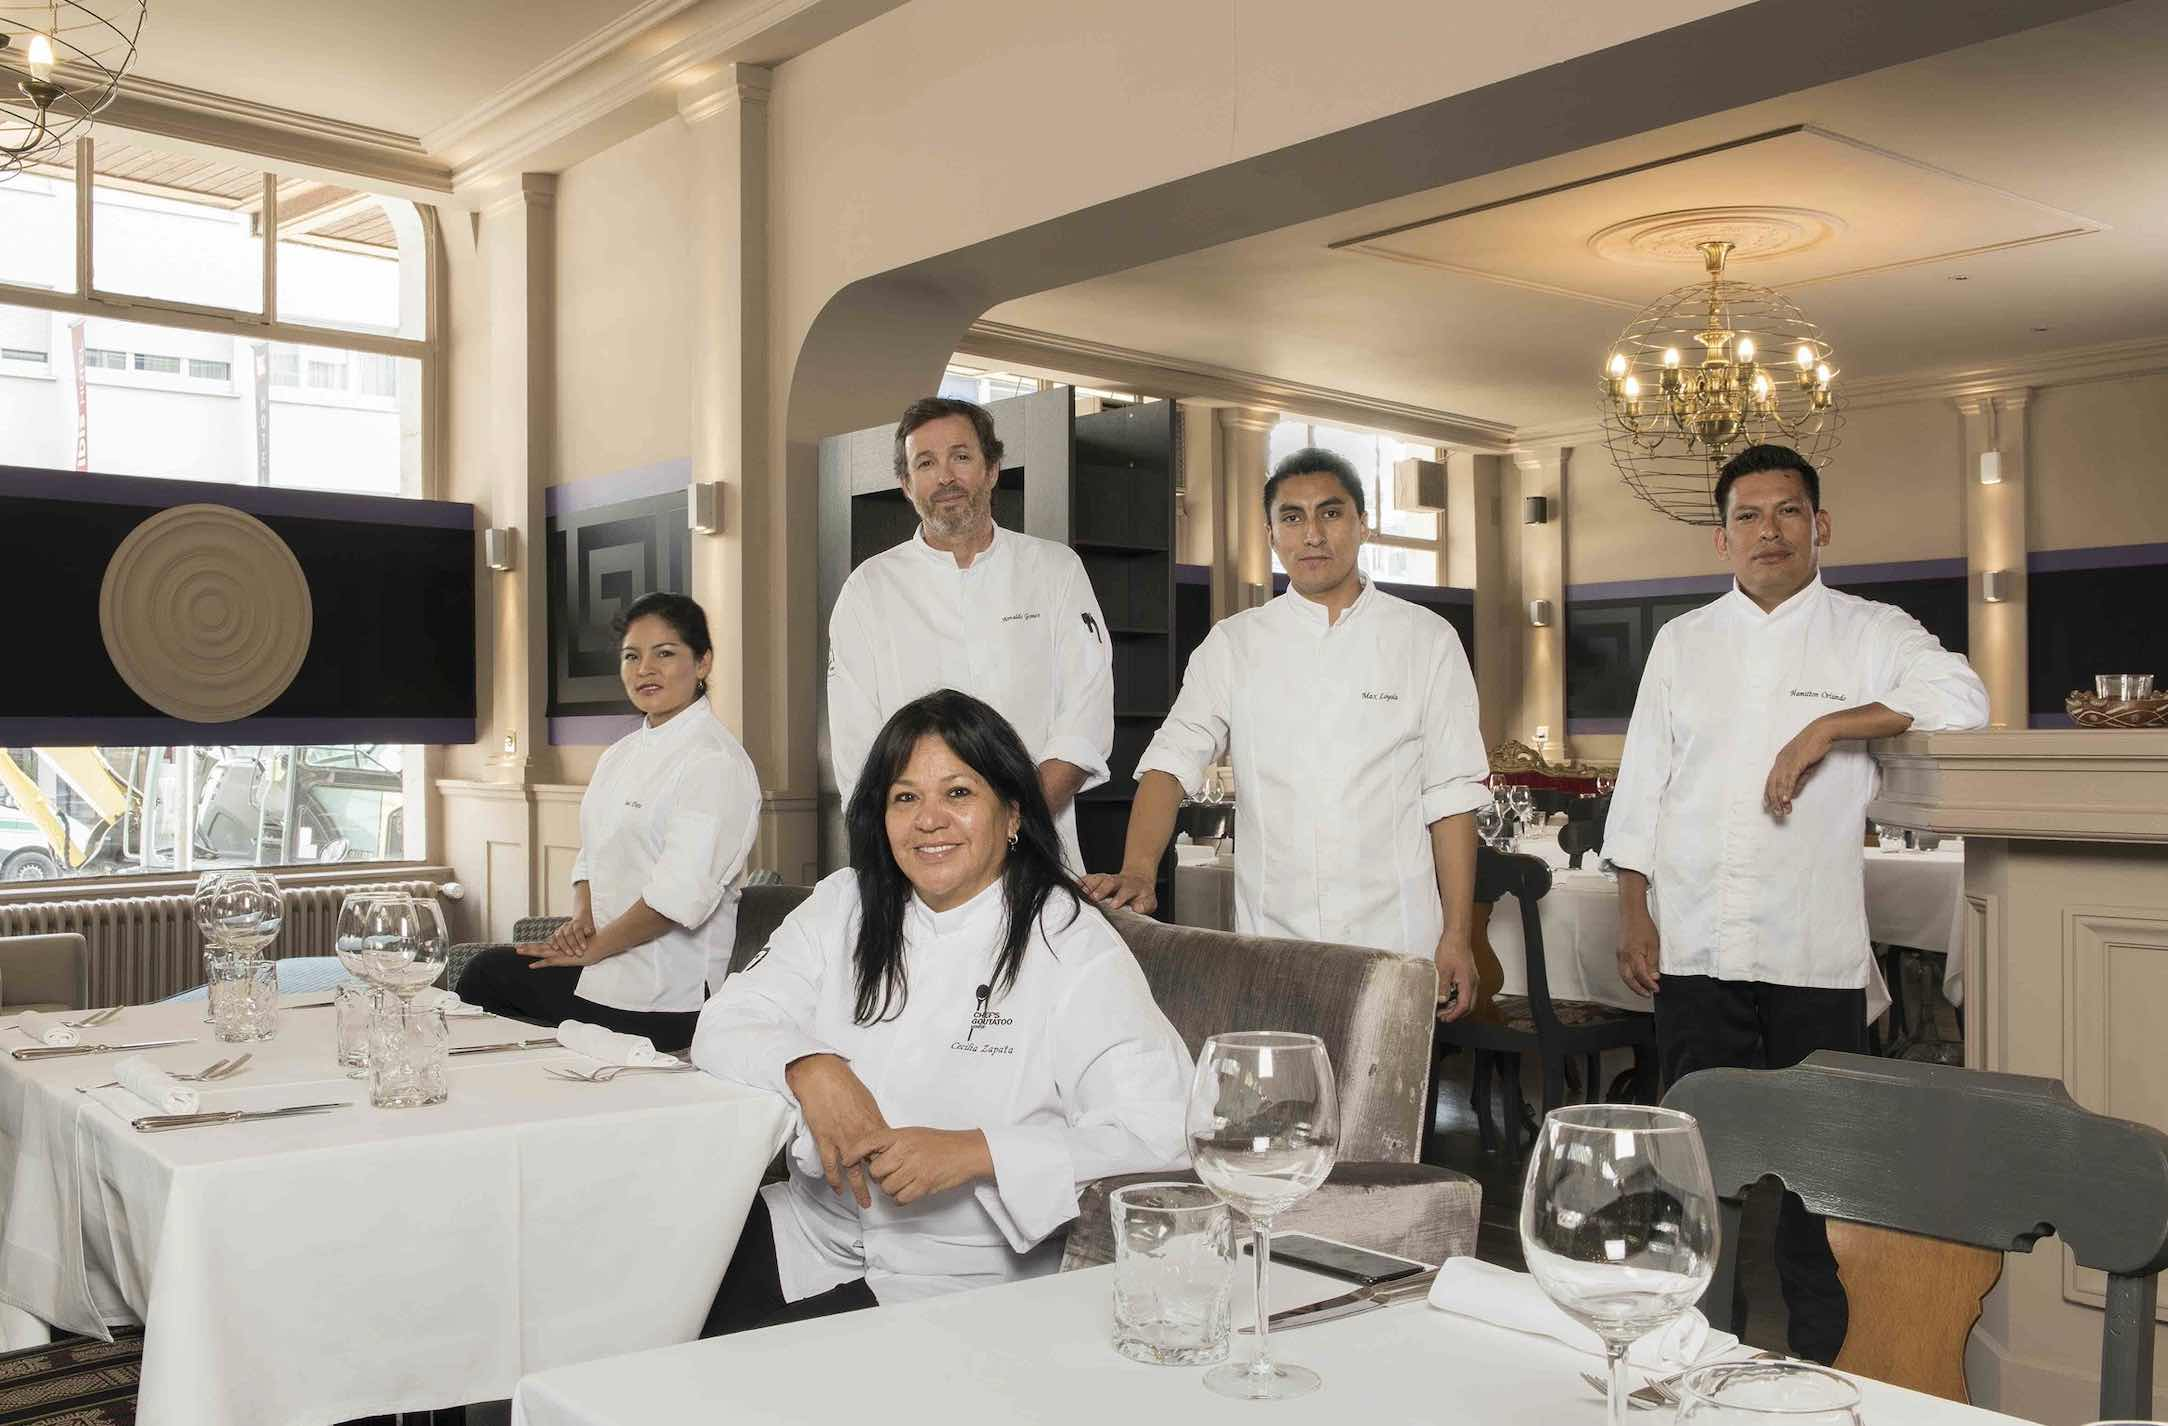 Celilia Zapata and Team at Pachacamac